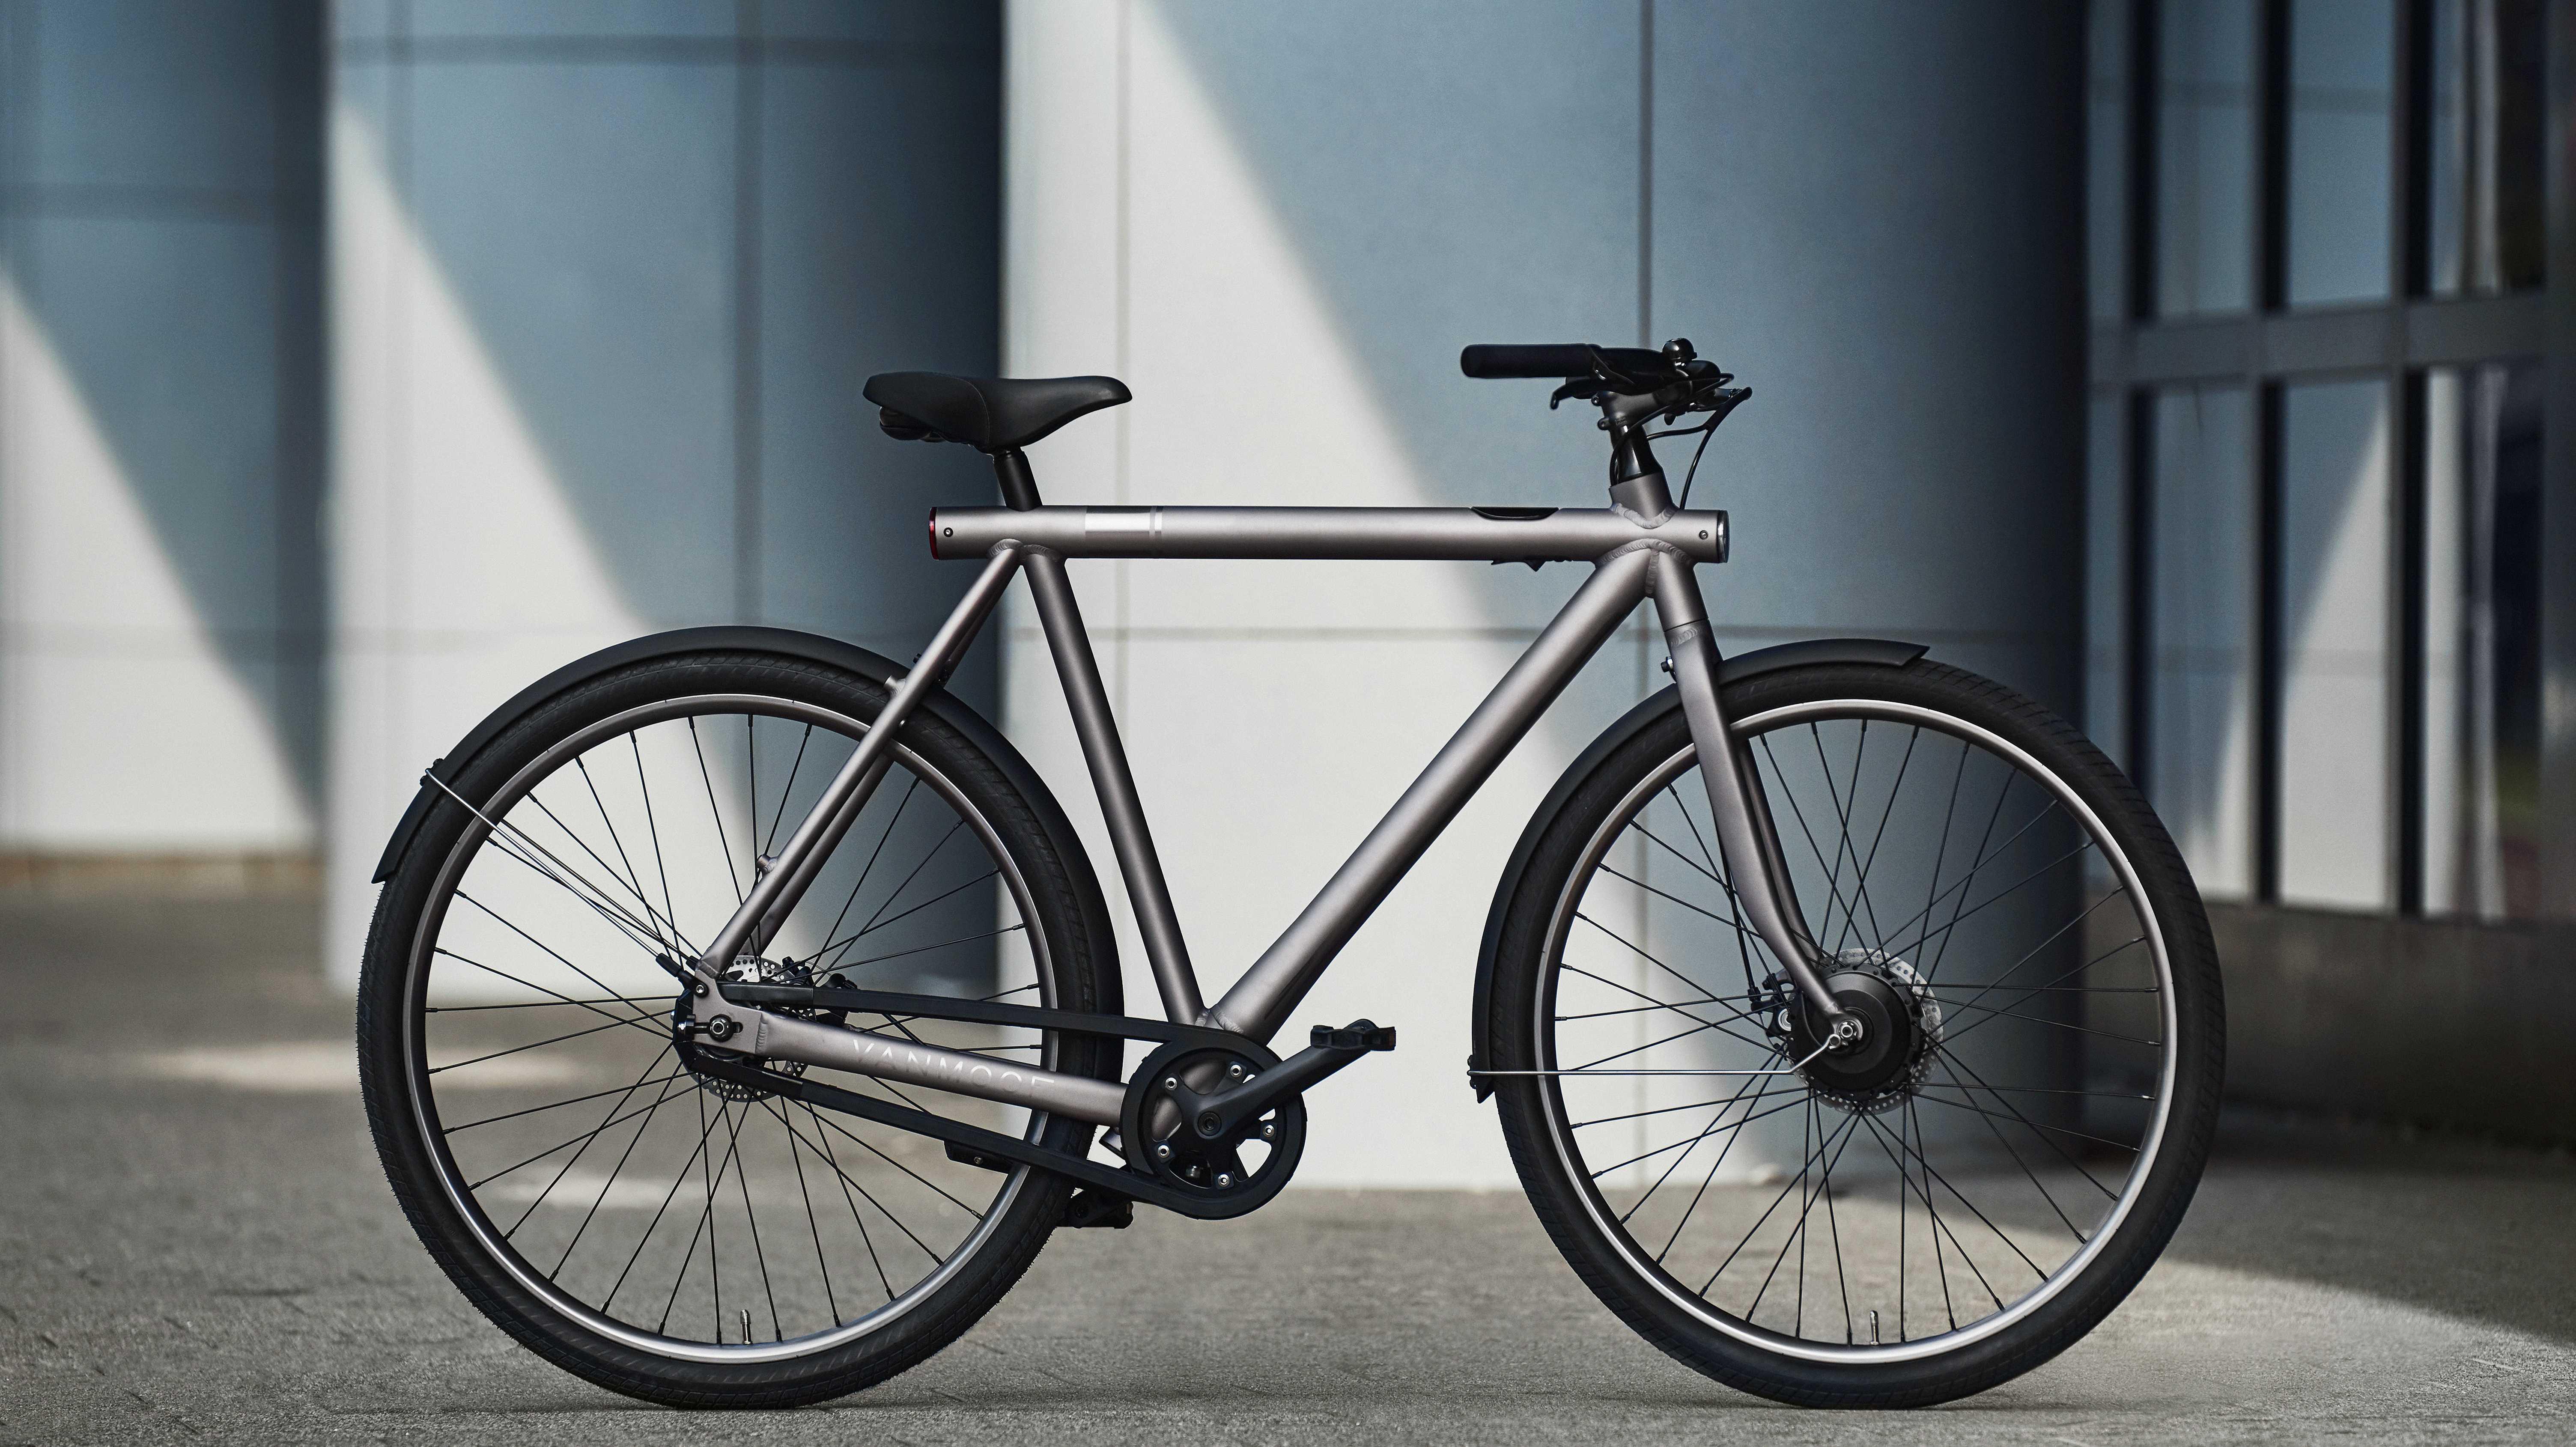 Fahrrad-Flatrate: Neue Verleihmodelle aus Holland